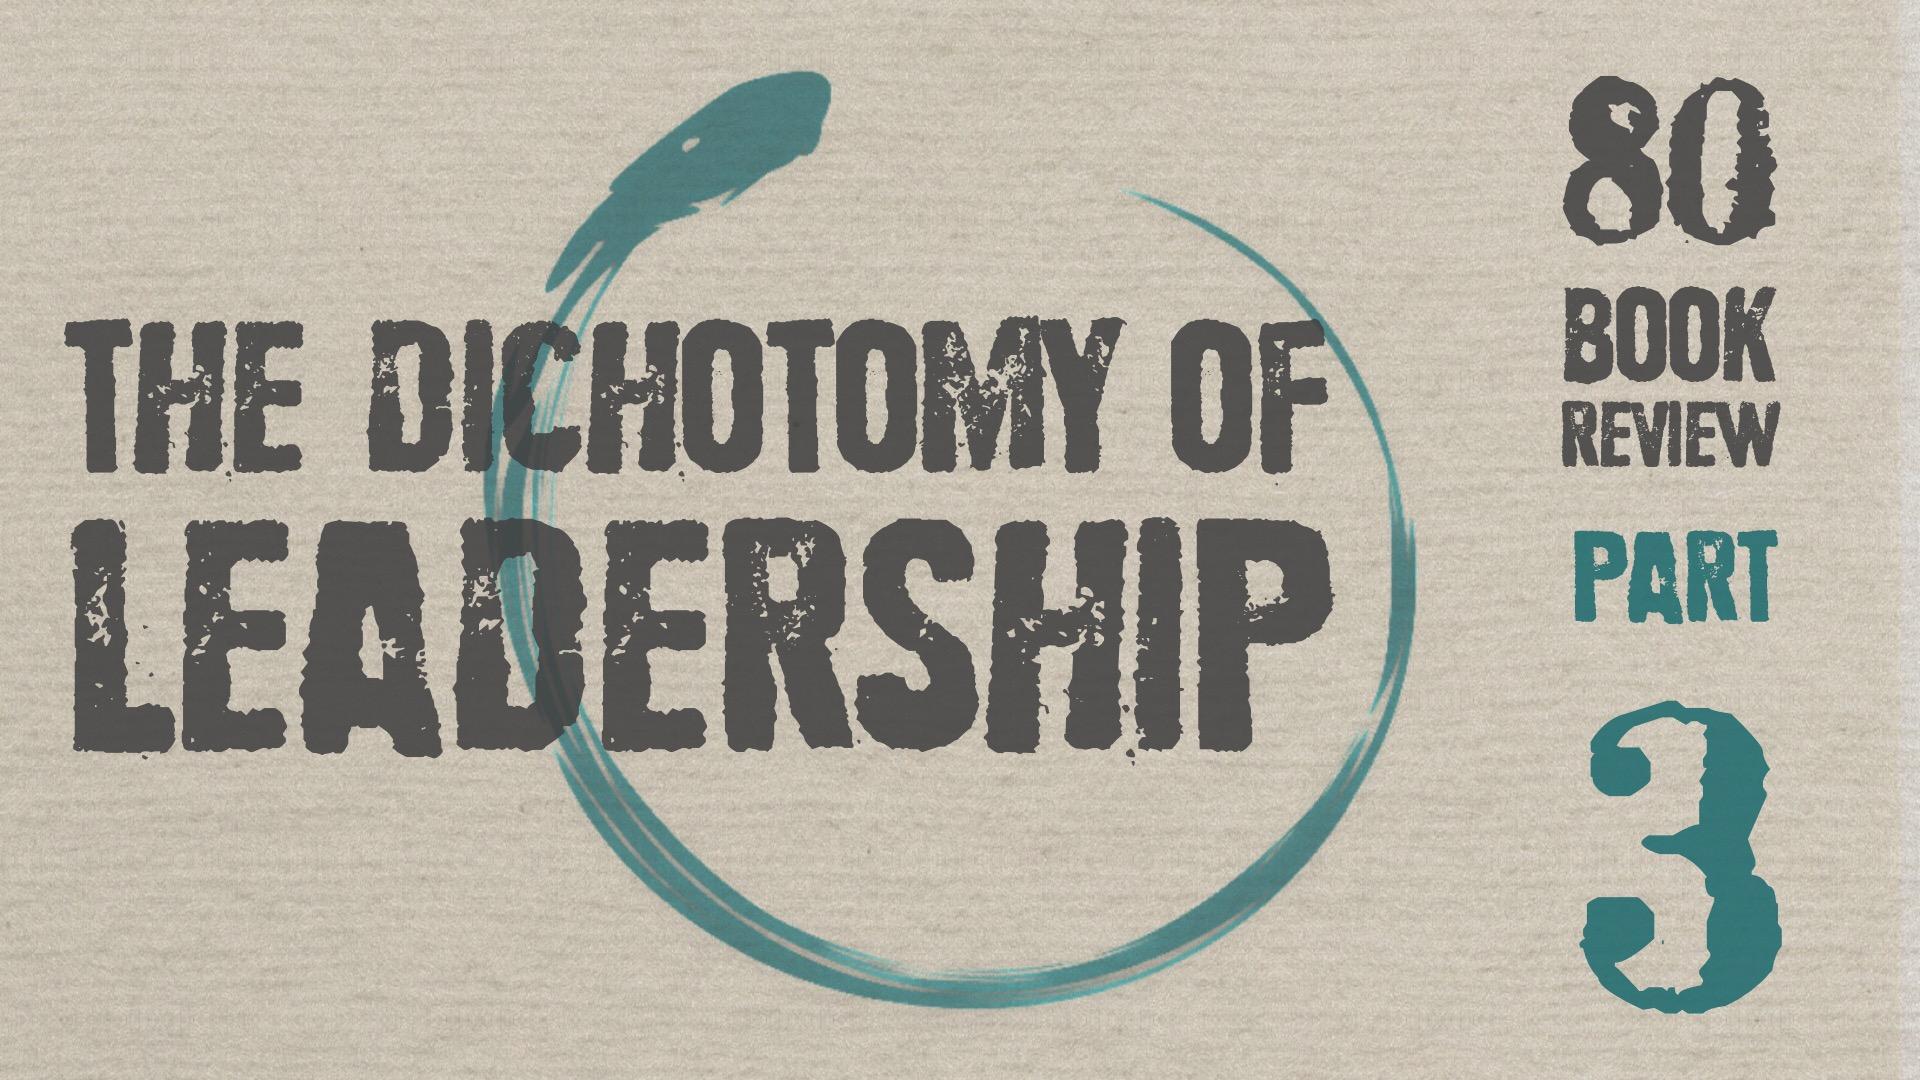 The Dichotomy Of Leadership Jocko Willink